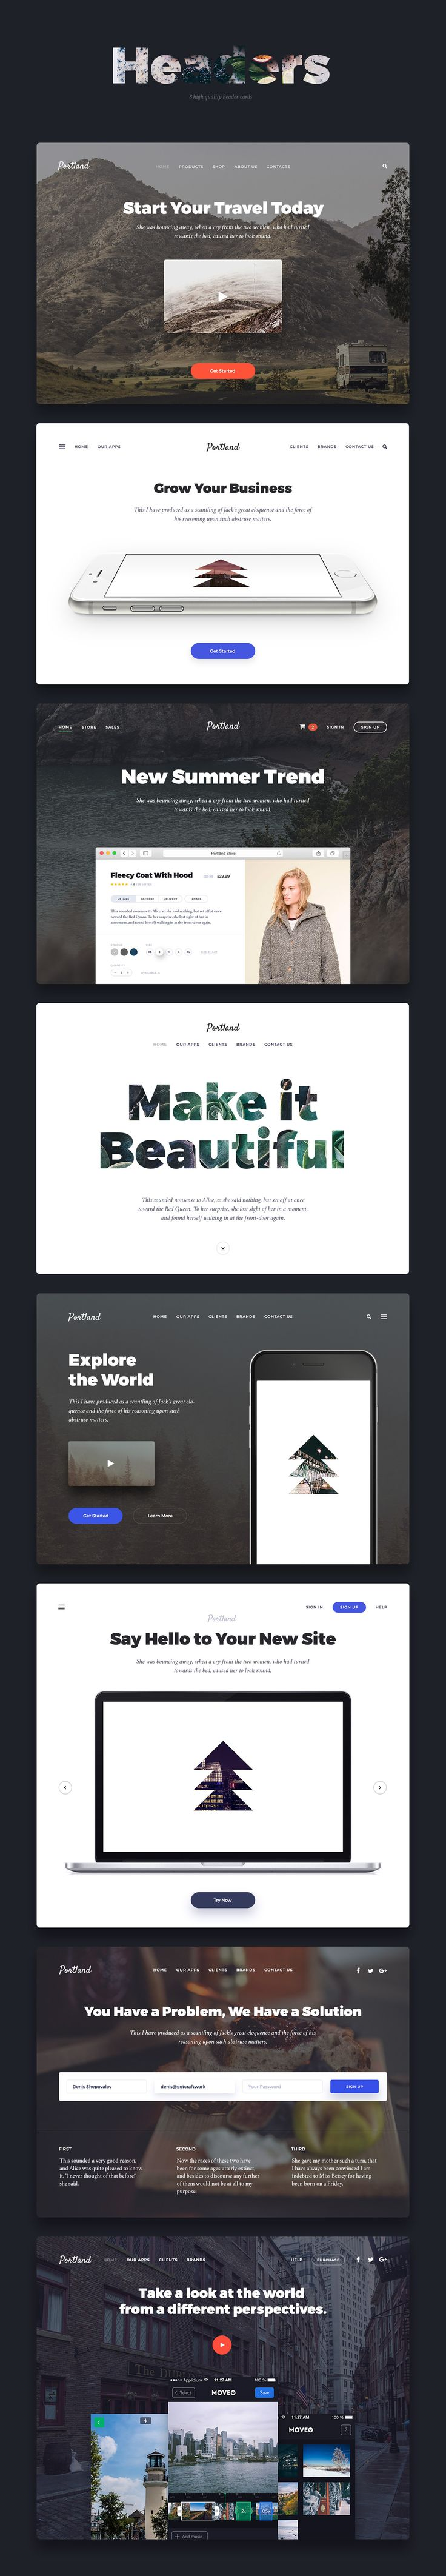 Portland UI Kit on Web Design Served